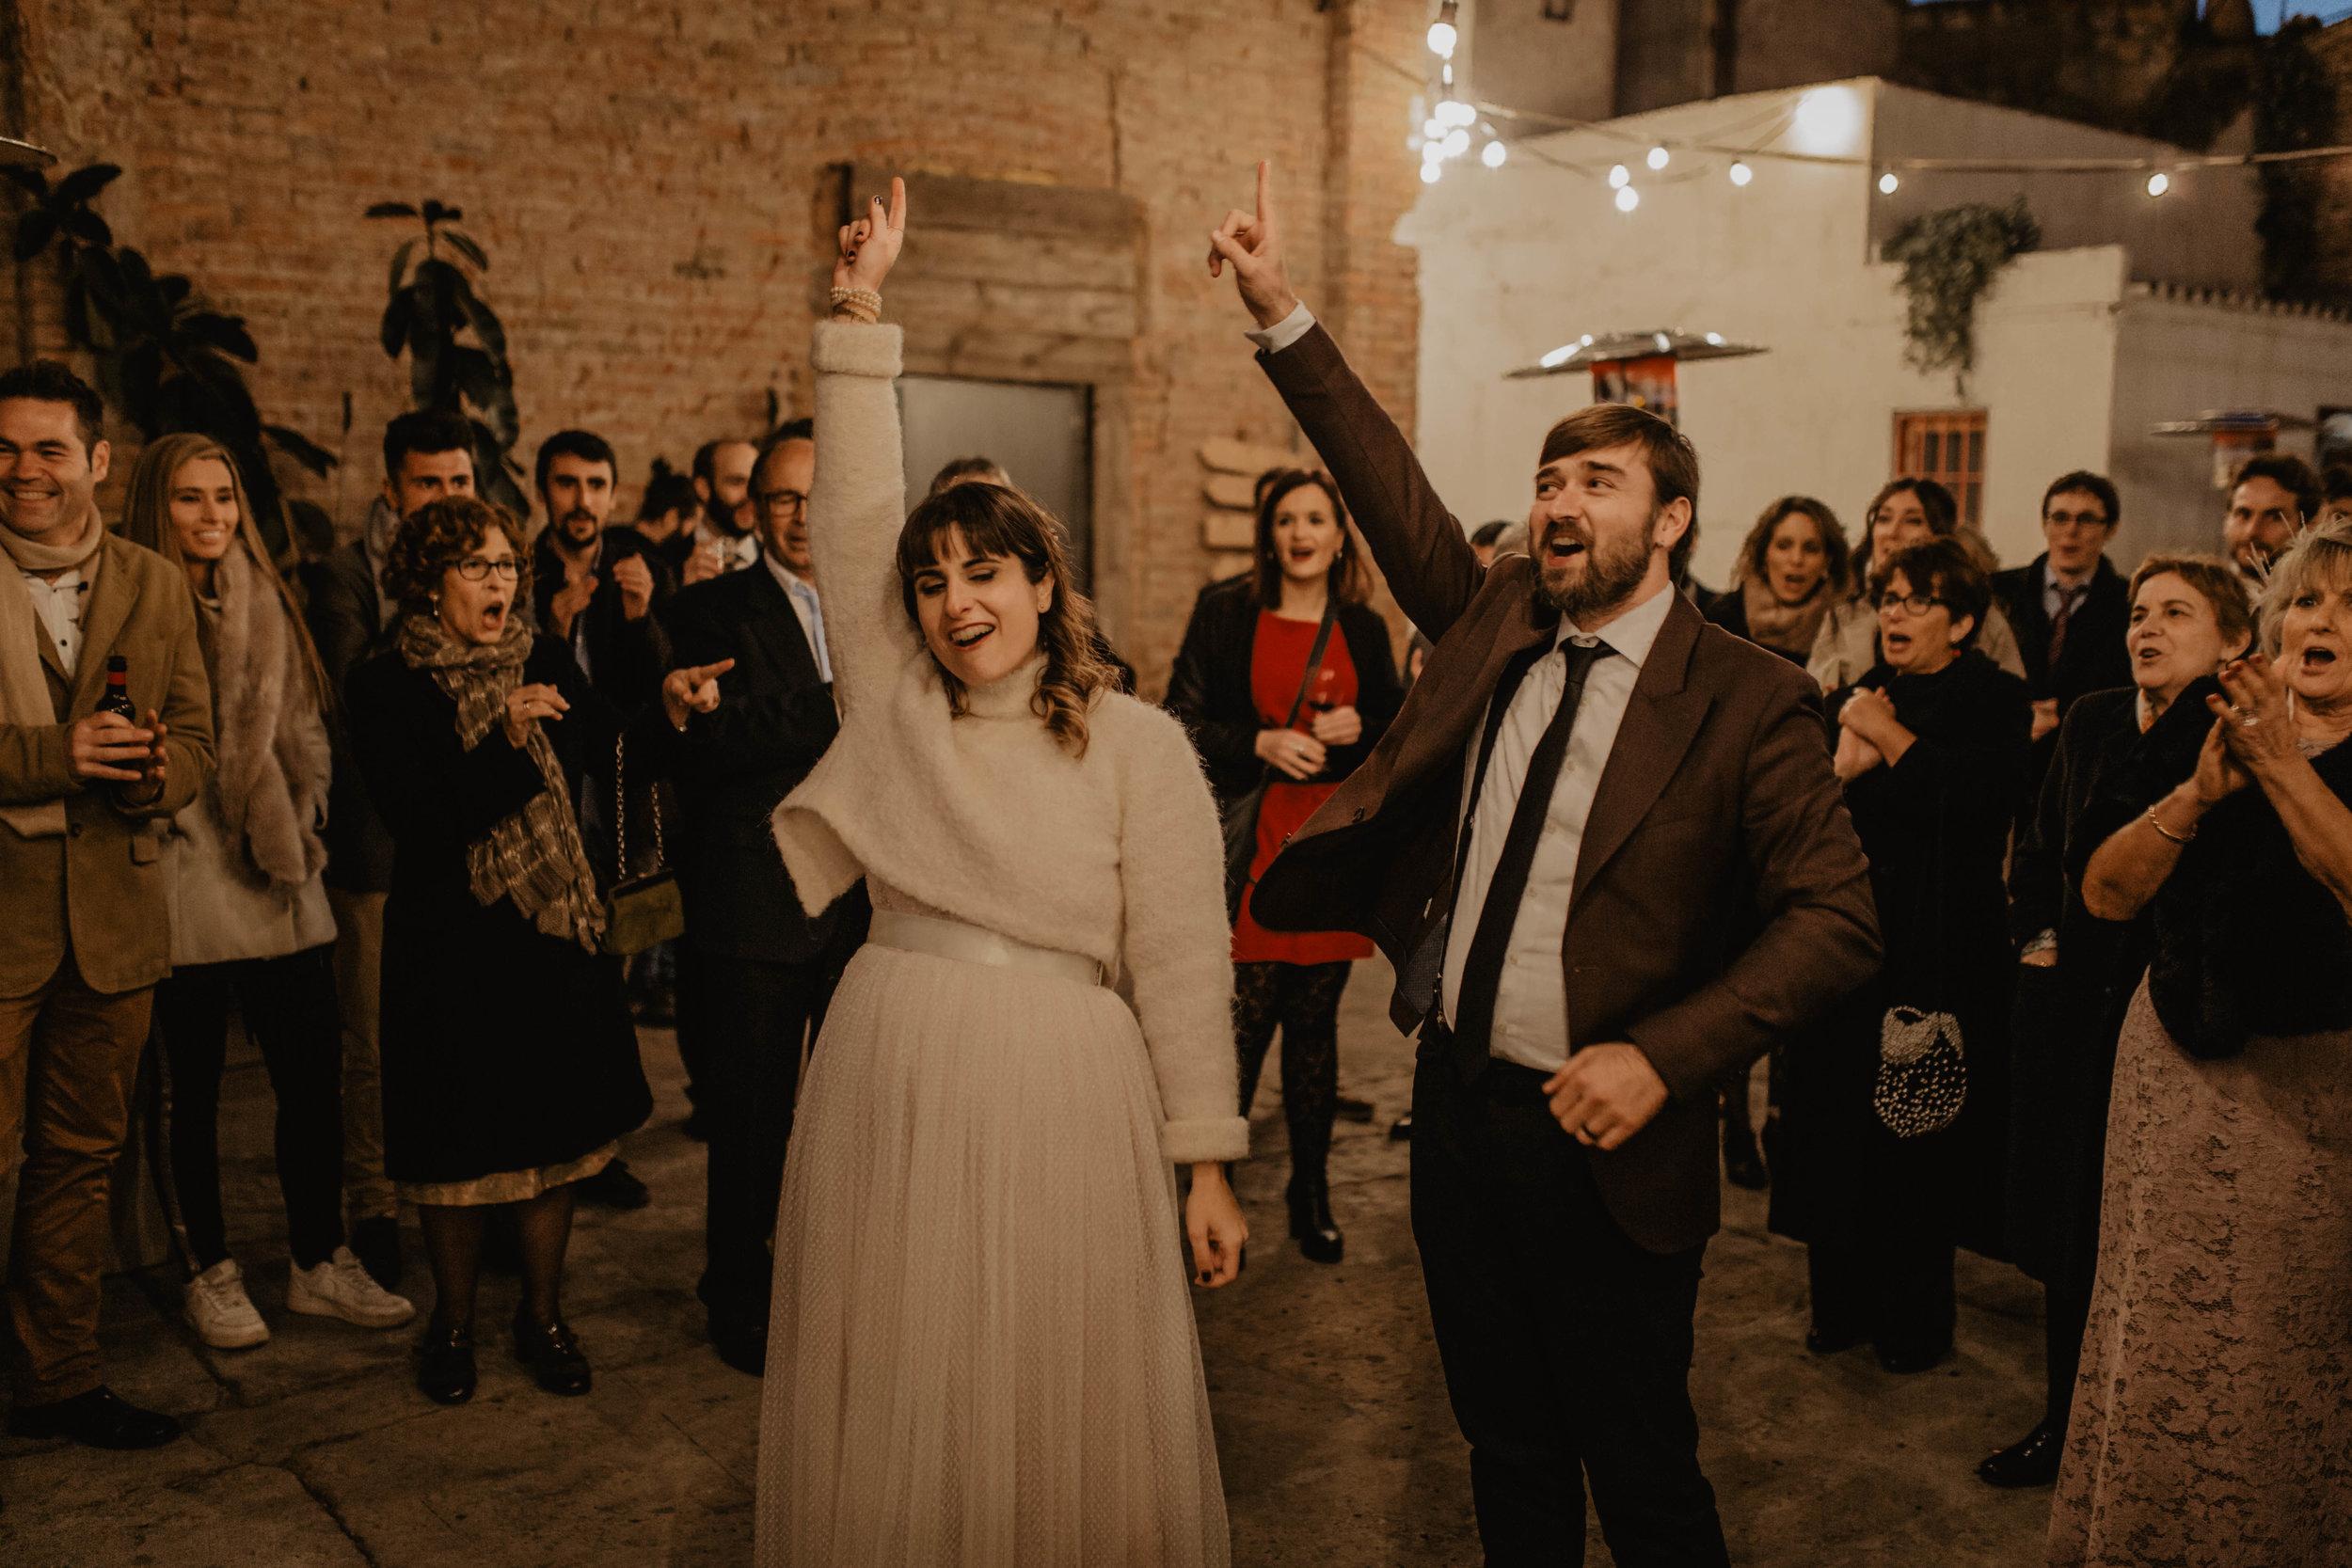 thenortherngirlphotography-photography-weddingphotography-couple-bodasconestilo-bodasenbarcelona-martadavid-790.jpg